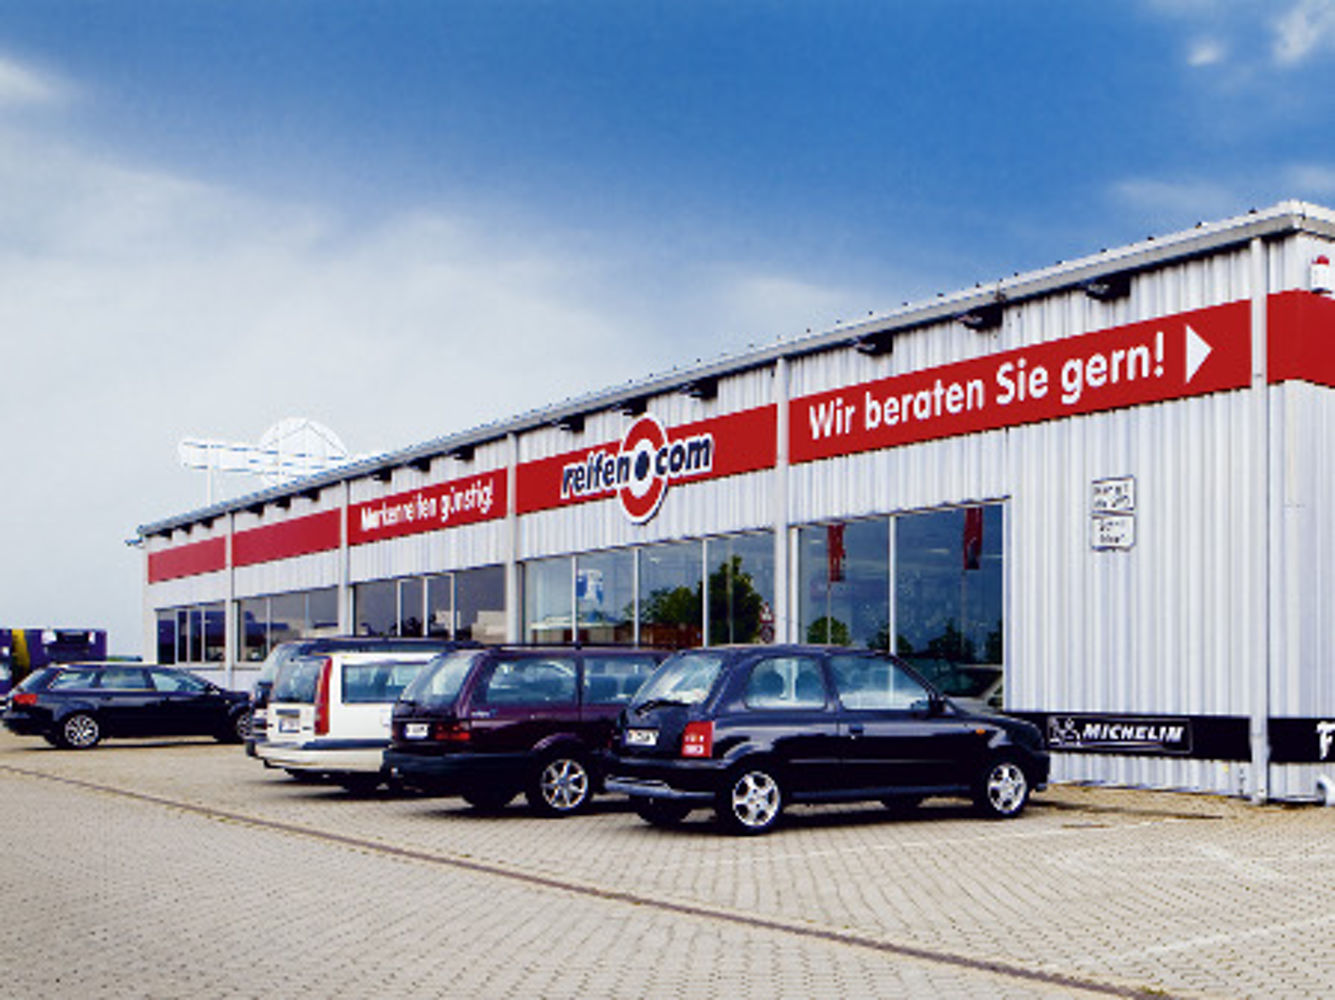 Reifenservice Reifencom Gmbh In Nürnberg Höfen Reifencom